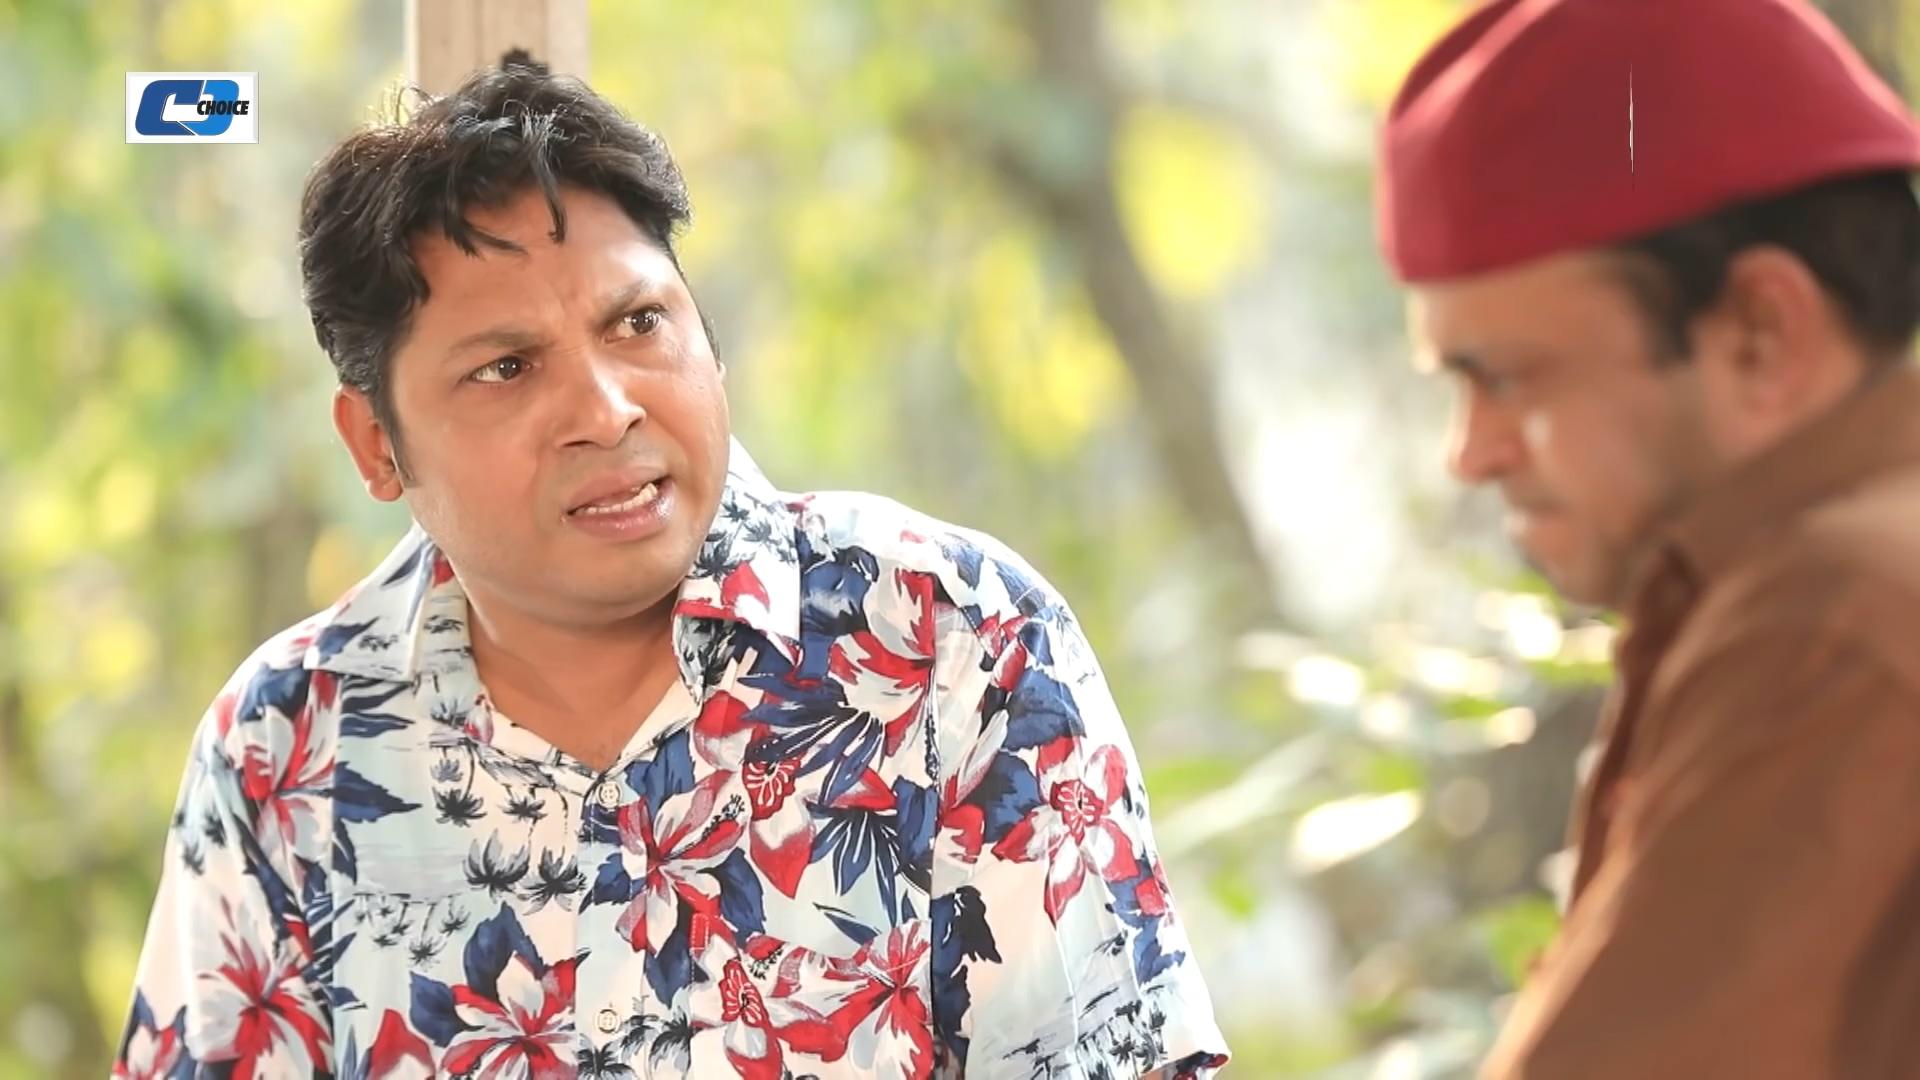 Shakkhi Hajir EiD Natok 2020 Aa Kho Mo Hasan Urmila Dipu Hazra 1080p WEBHD.mp4 20200529 074313.119